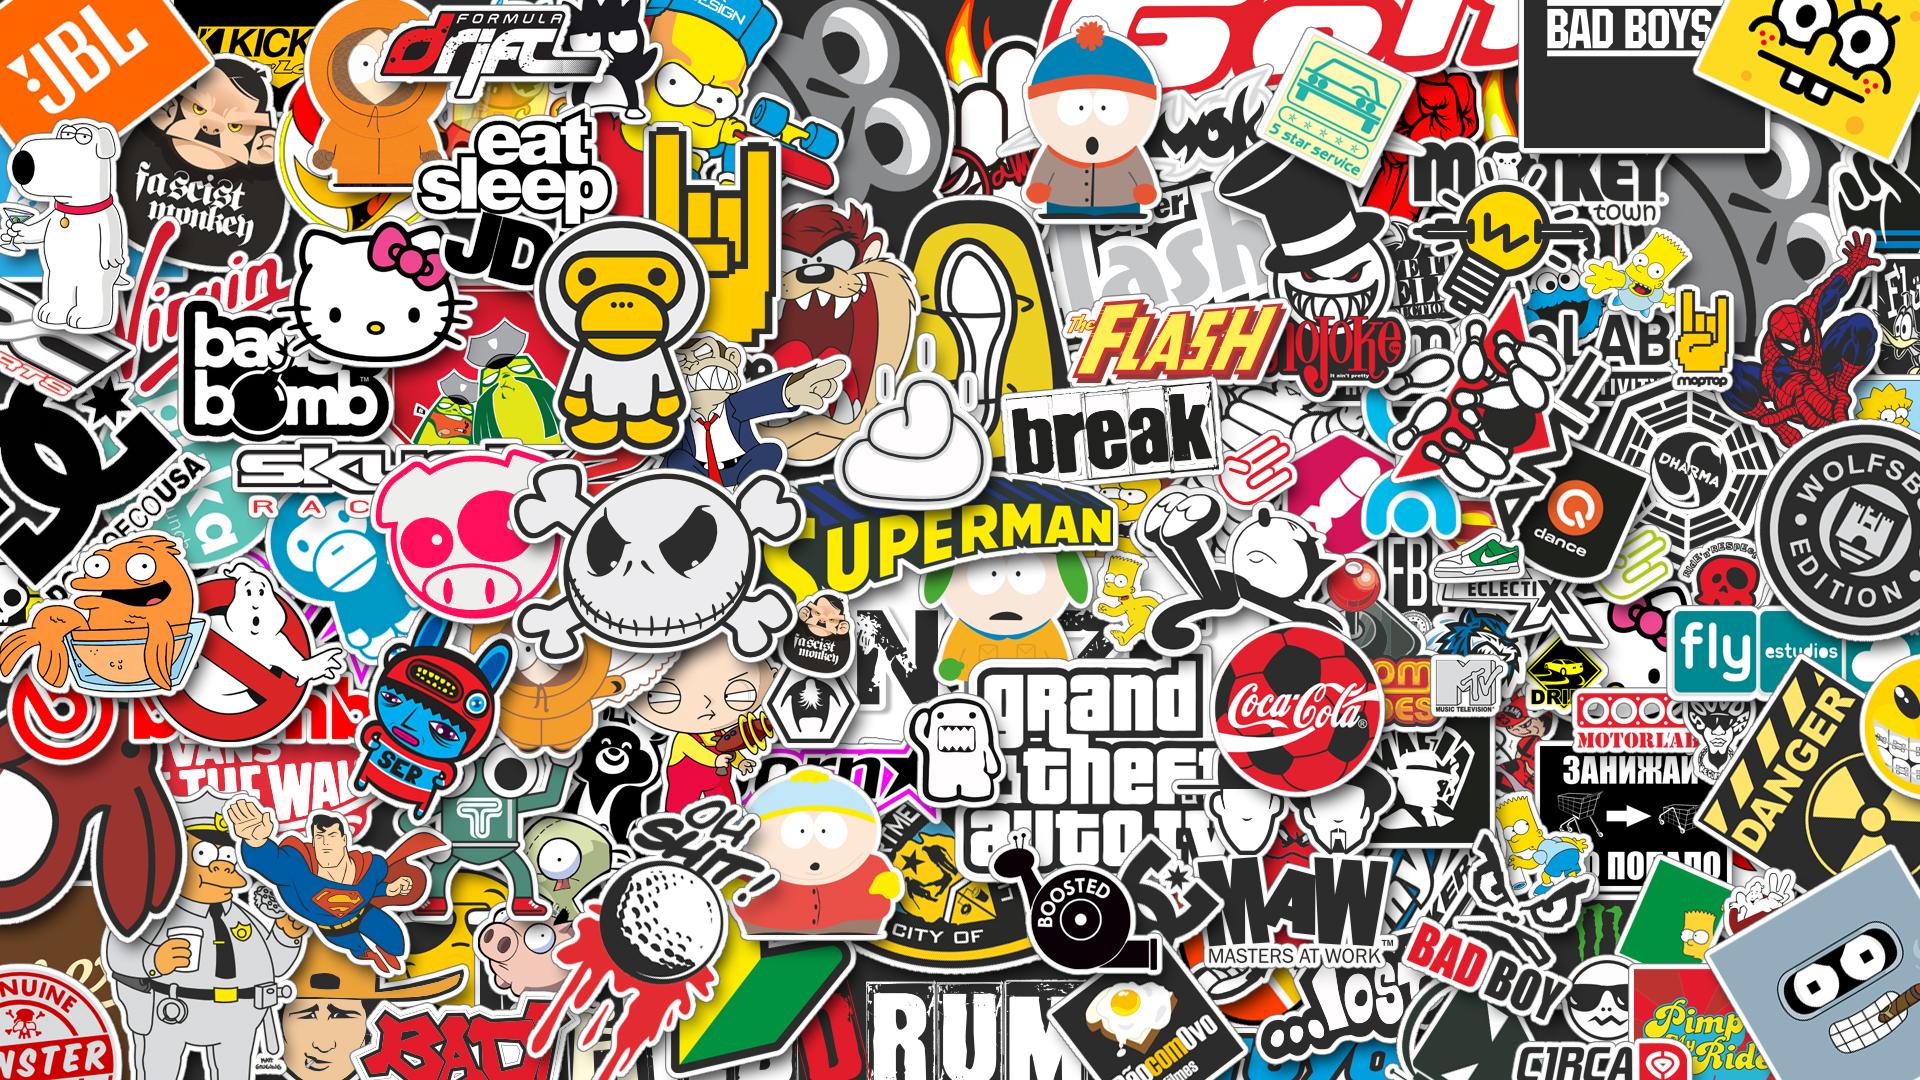 Sticker bomb dans le genre http fc05 deviantart net fs71 f 2012 320 f 6 stickerbomb by vicing d5l6d3o jpg